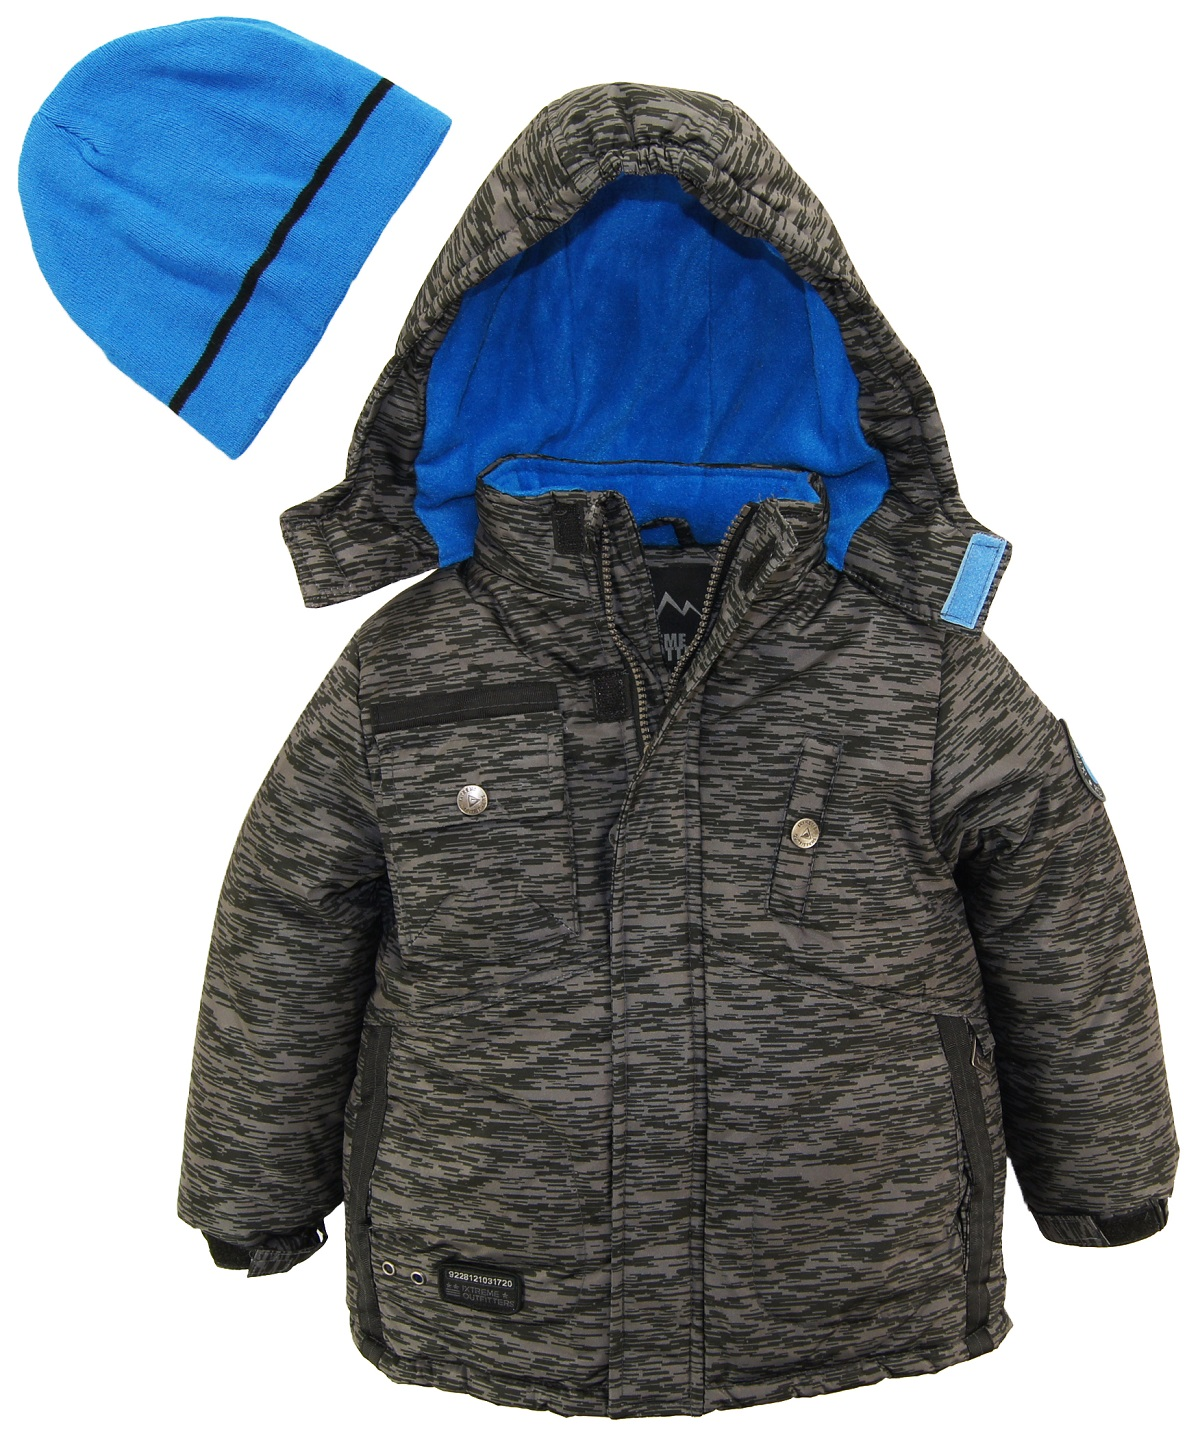 076156fd6 ixtreme - ixtreme toddler boys colorblock heavy snowsuit winter ski ...